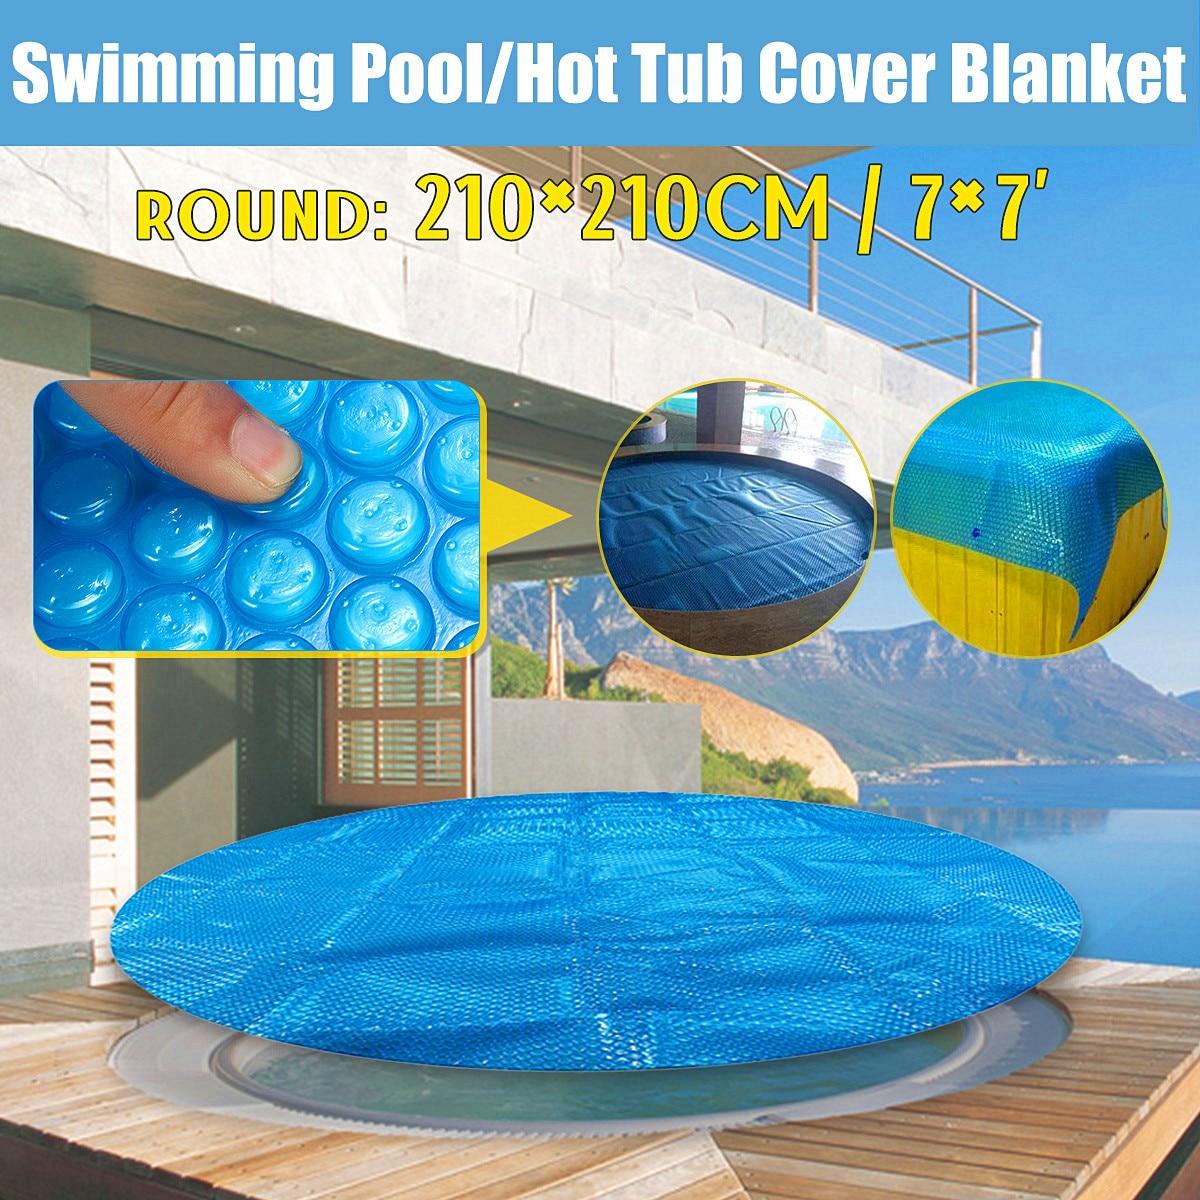 7' Round Family Pool Swimming Pool Hot Tub Cover Blanket Kid Adult Children Blue Garden Balcony Outdoor Play Pool Cover чехол pool cover на каркасные бассейны 258х179см jilong